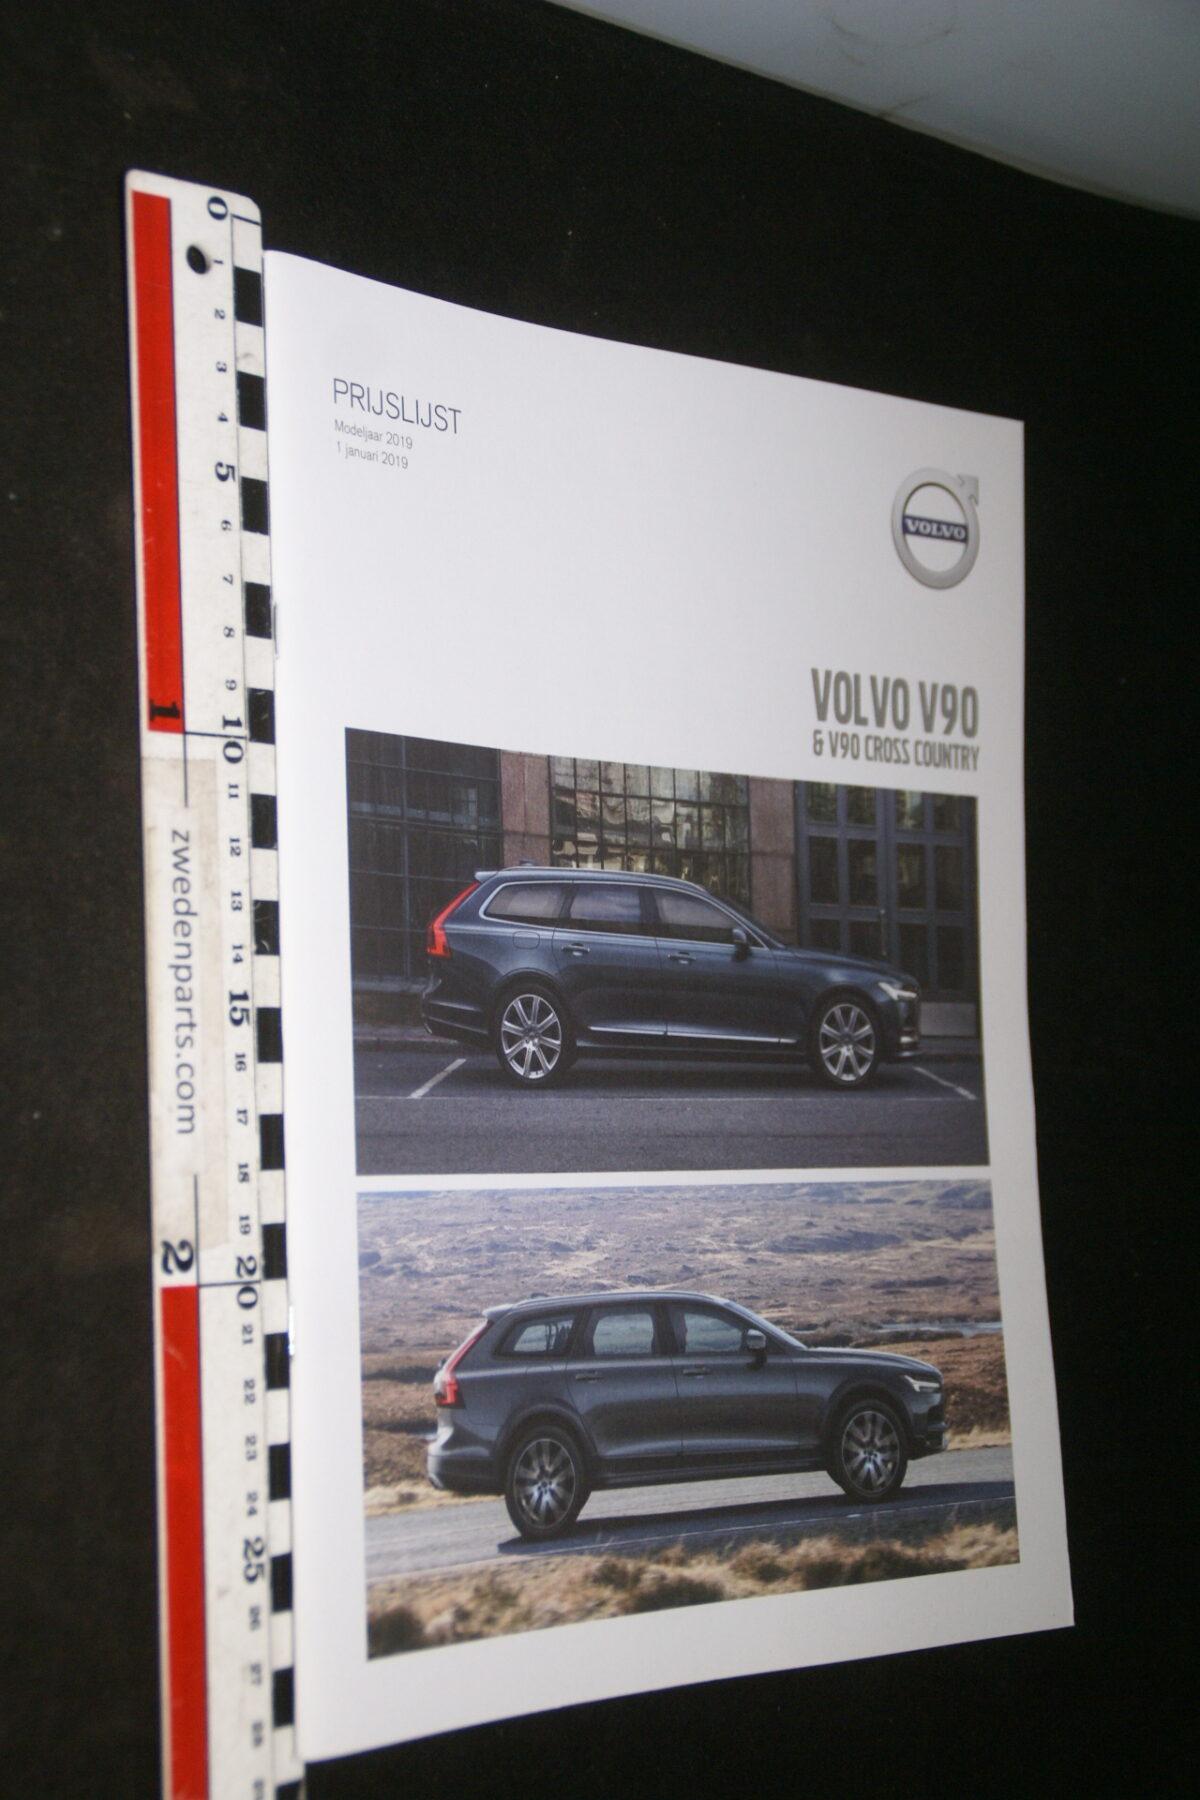 DSC04462 2019 brochure Volvo V90 nr. MY 19 01-2019 V3-18a12ffa